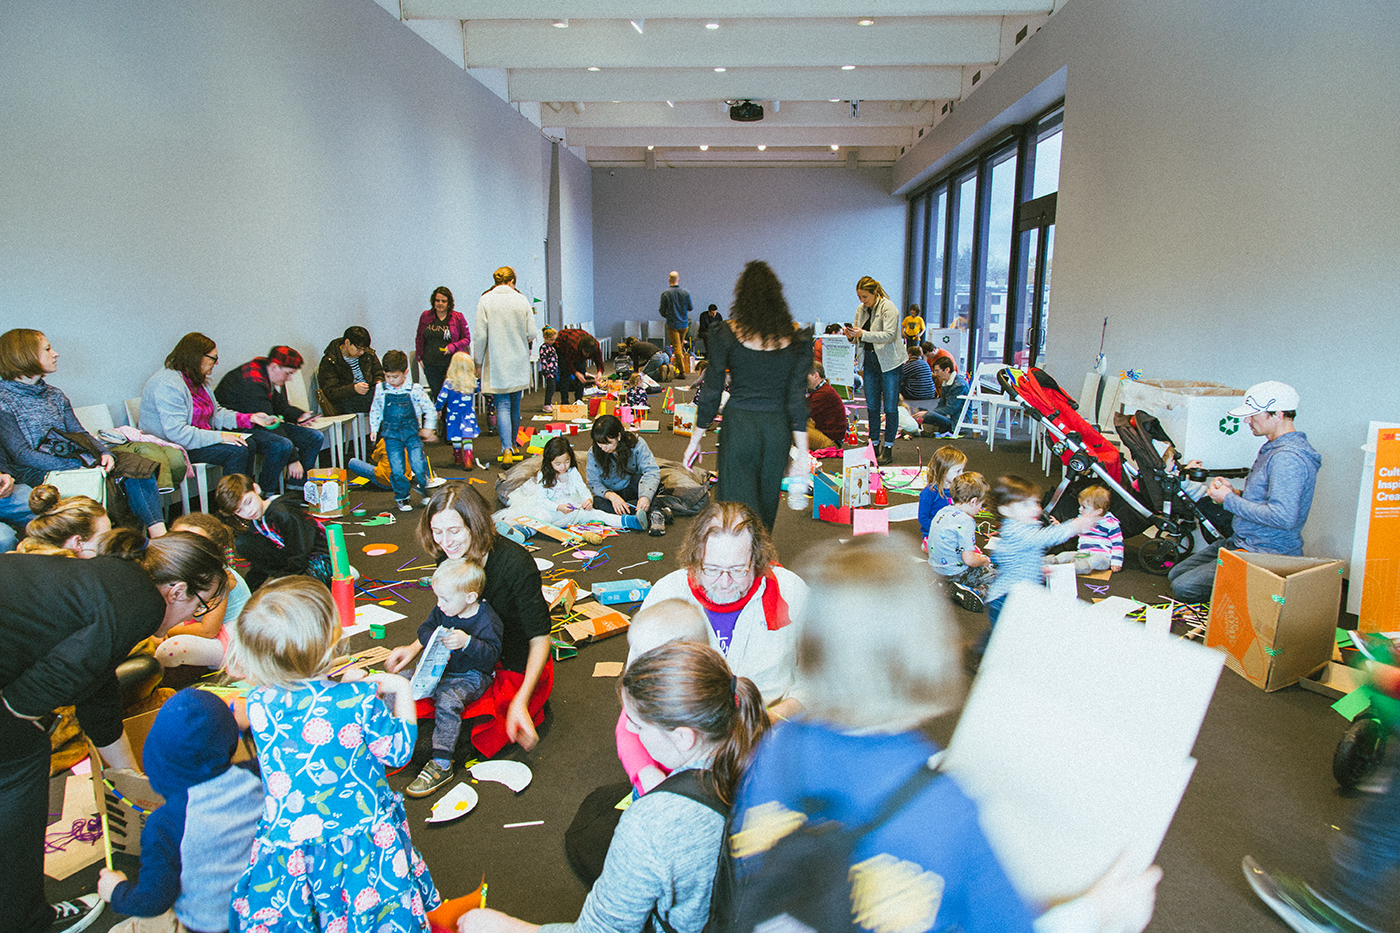 6. Negotiating Borders, 2019, Public Program curated for the Walker Art Center, Minneapolis, MI